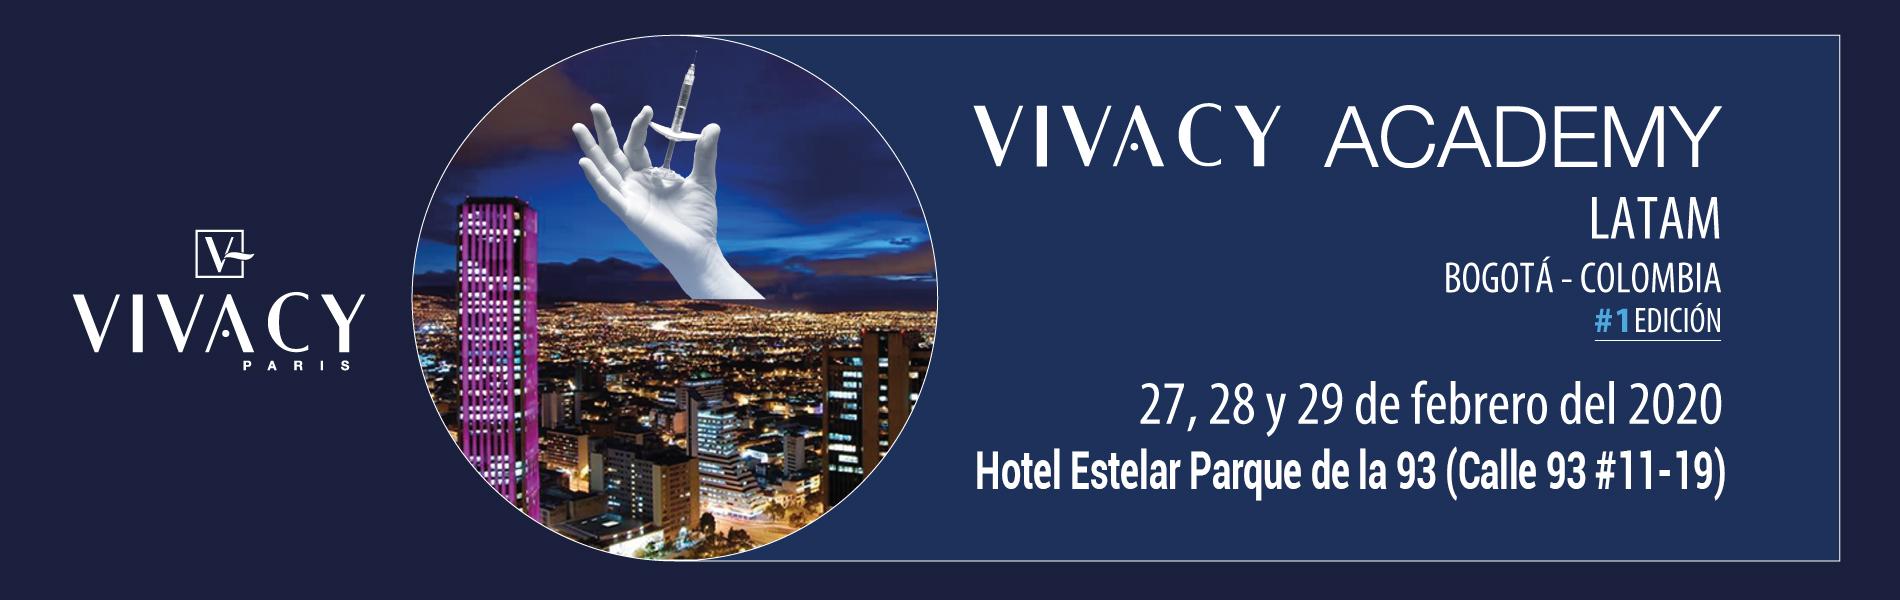 banner-vivacy